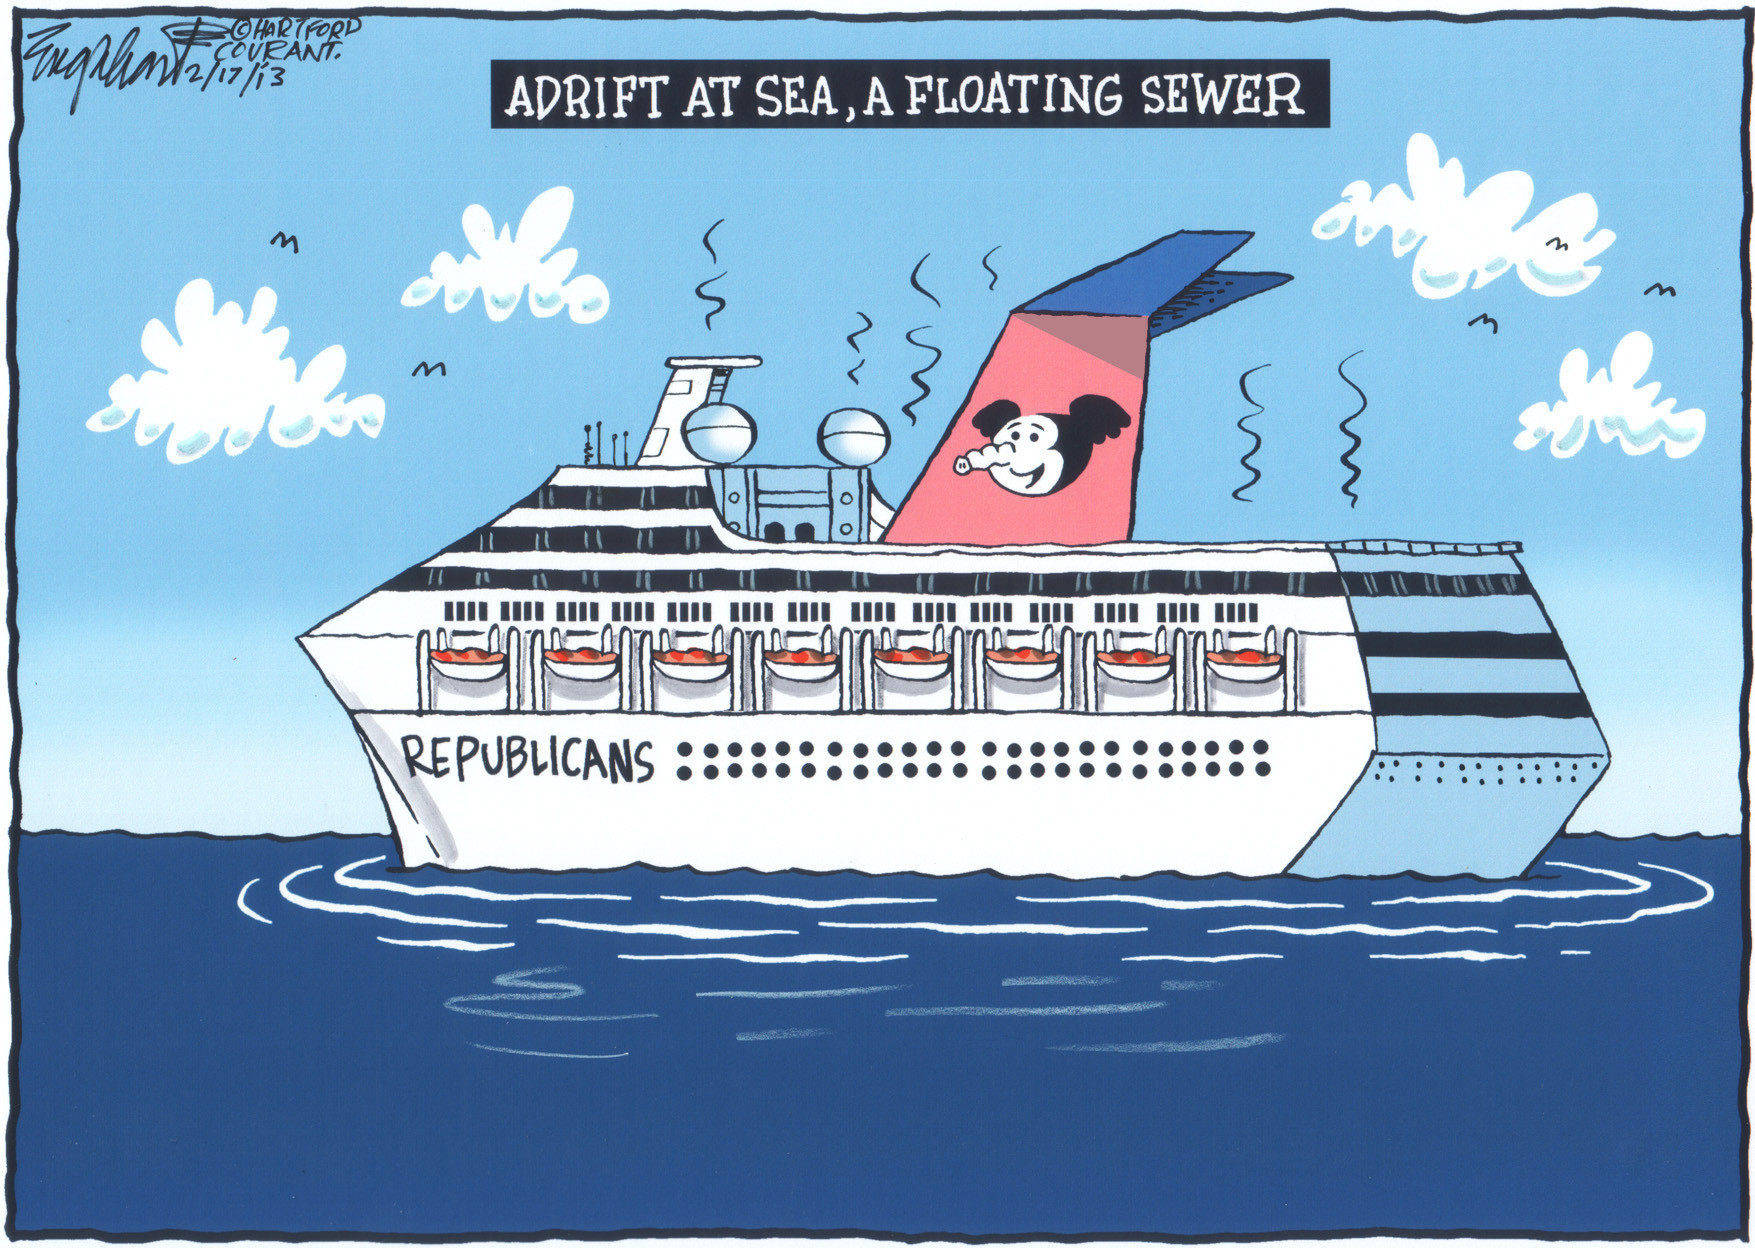 Carnival Cruise Ship Stranded Adrift Hartford Courant - Stranded cruise ship